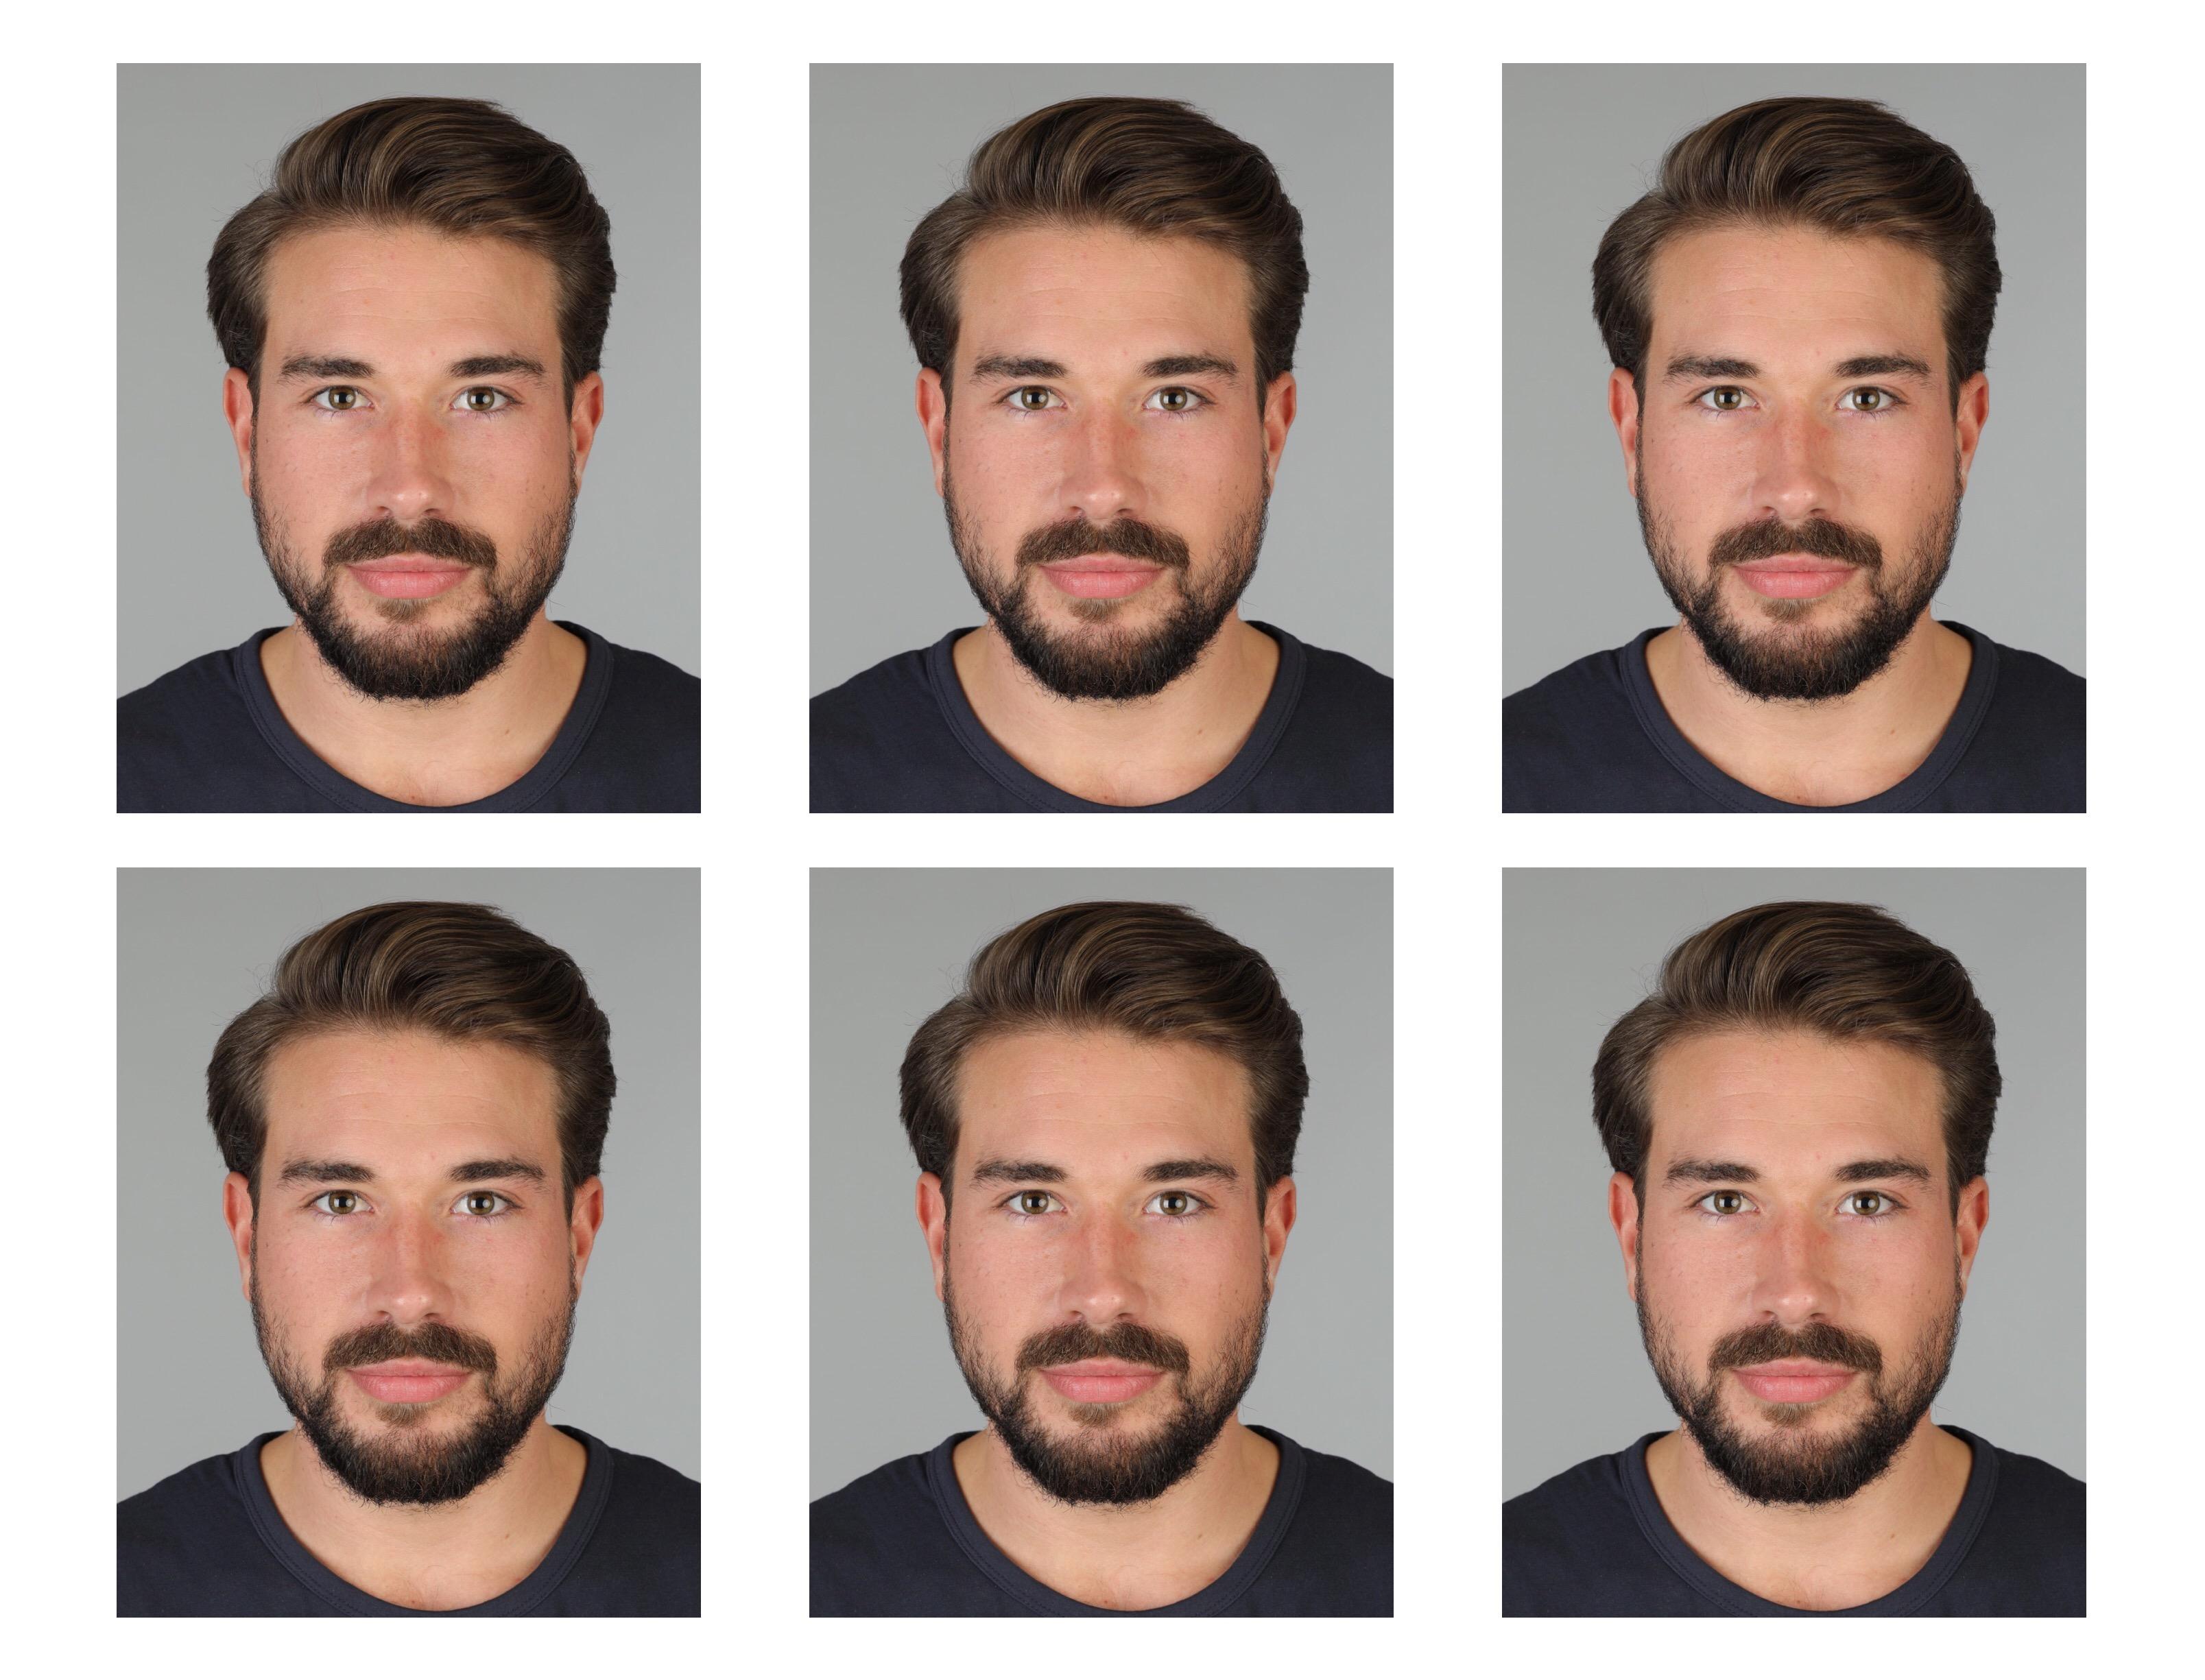 Passfotos Passbilder biometrisch